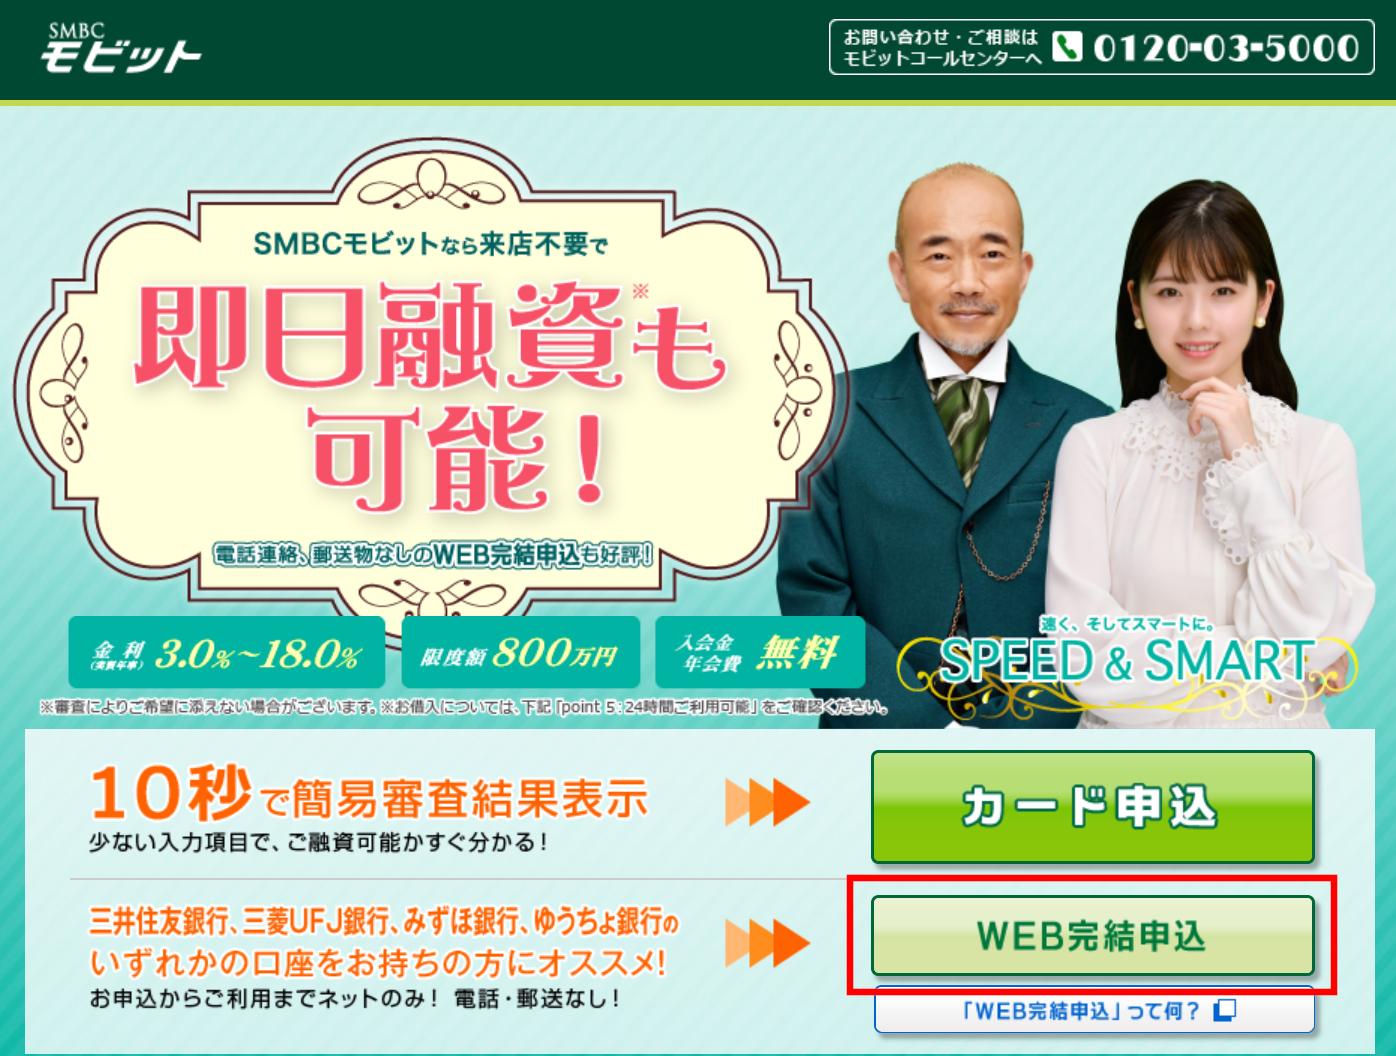 SMBCモビット公式サイトからWEB完結申込を始める